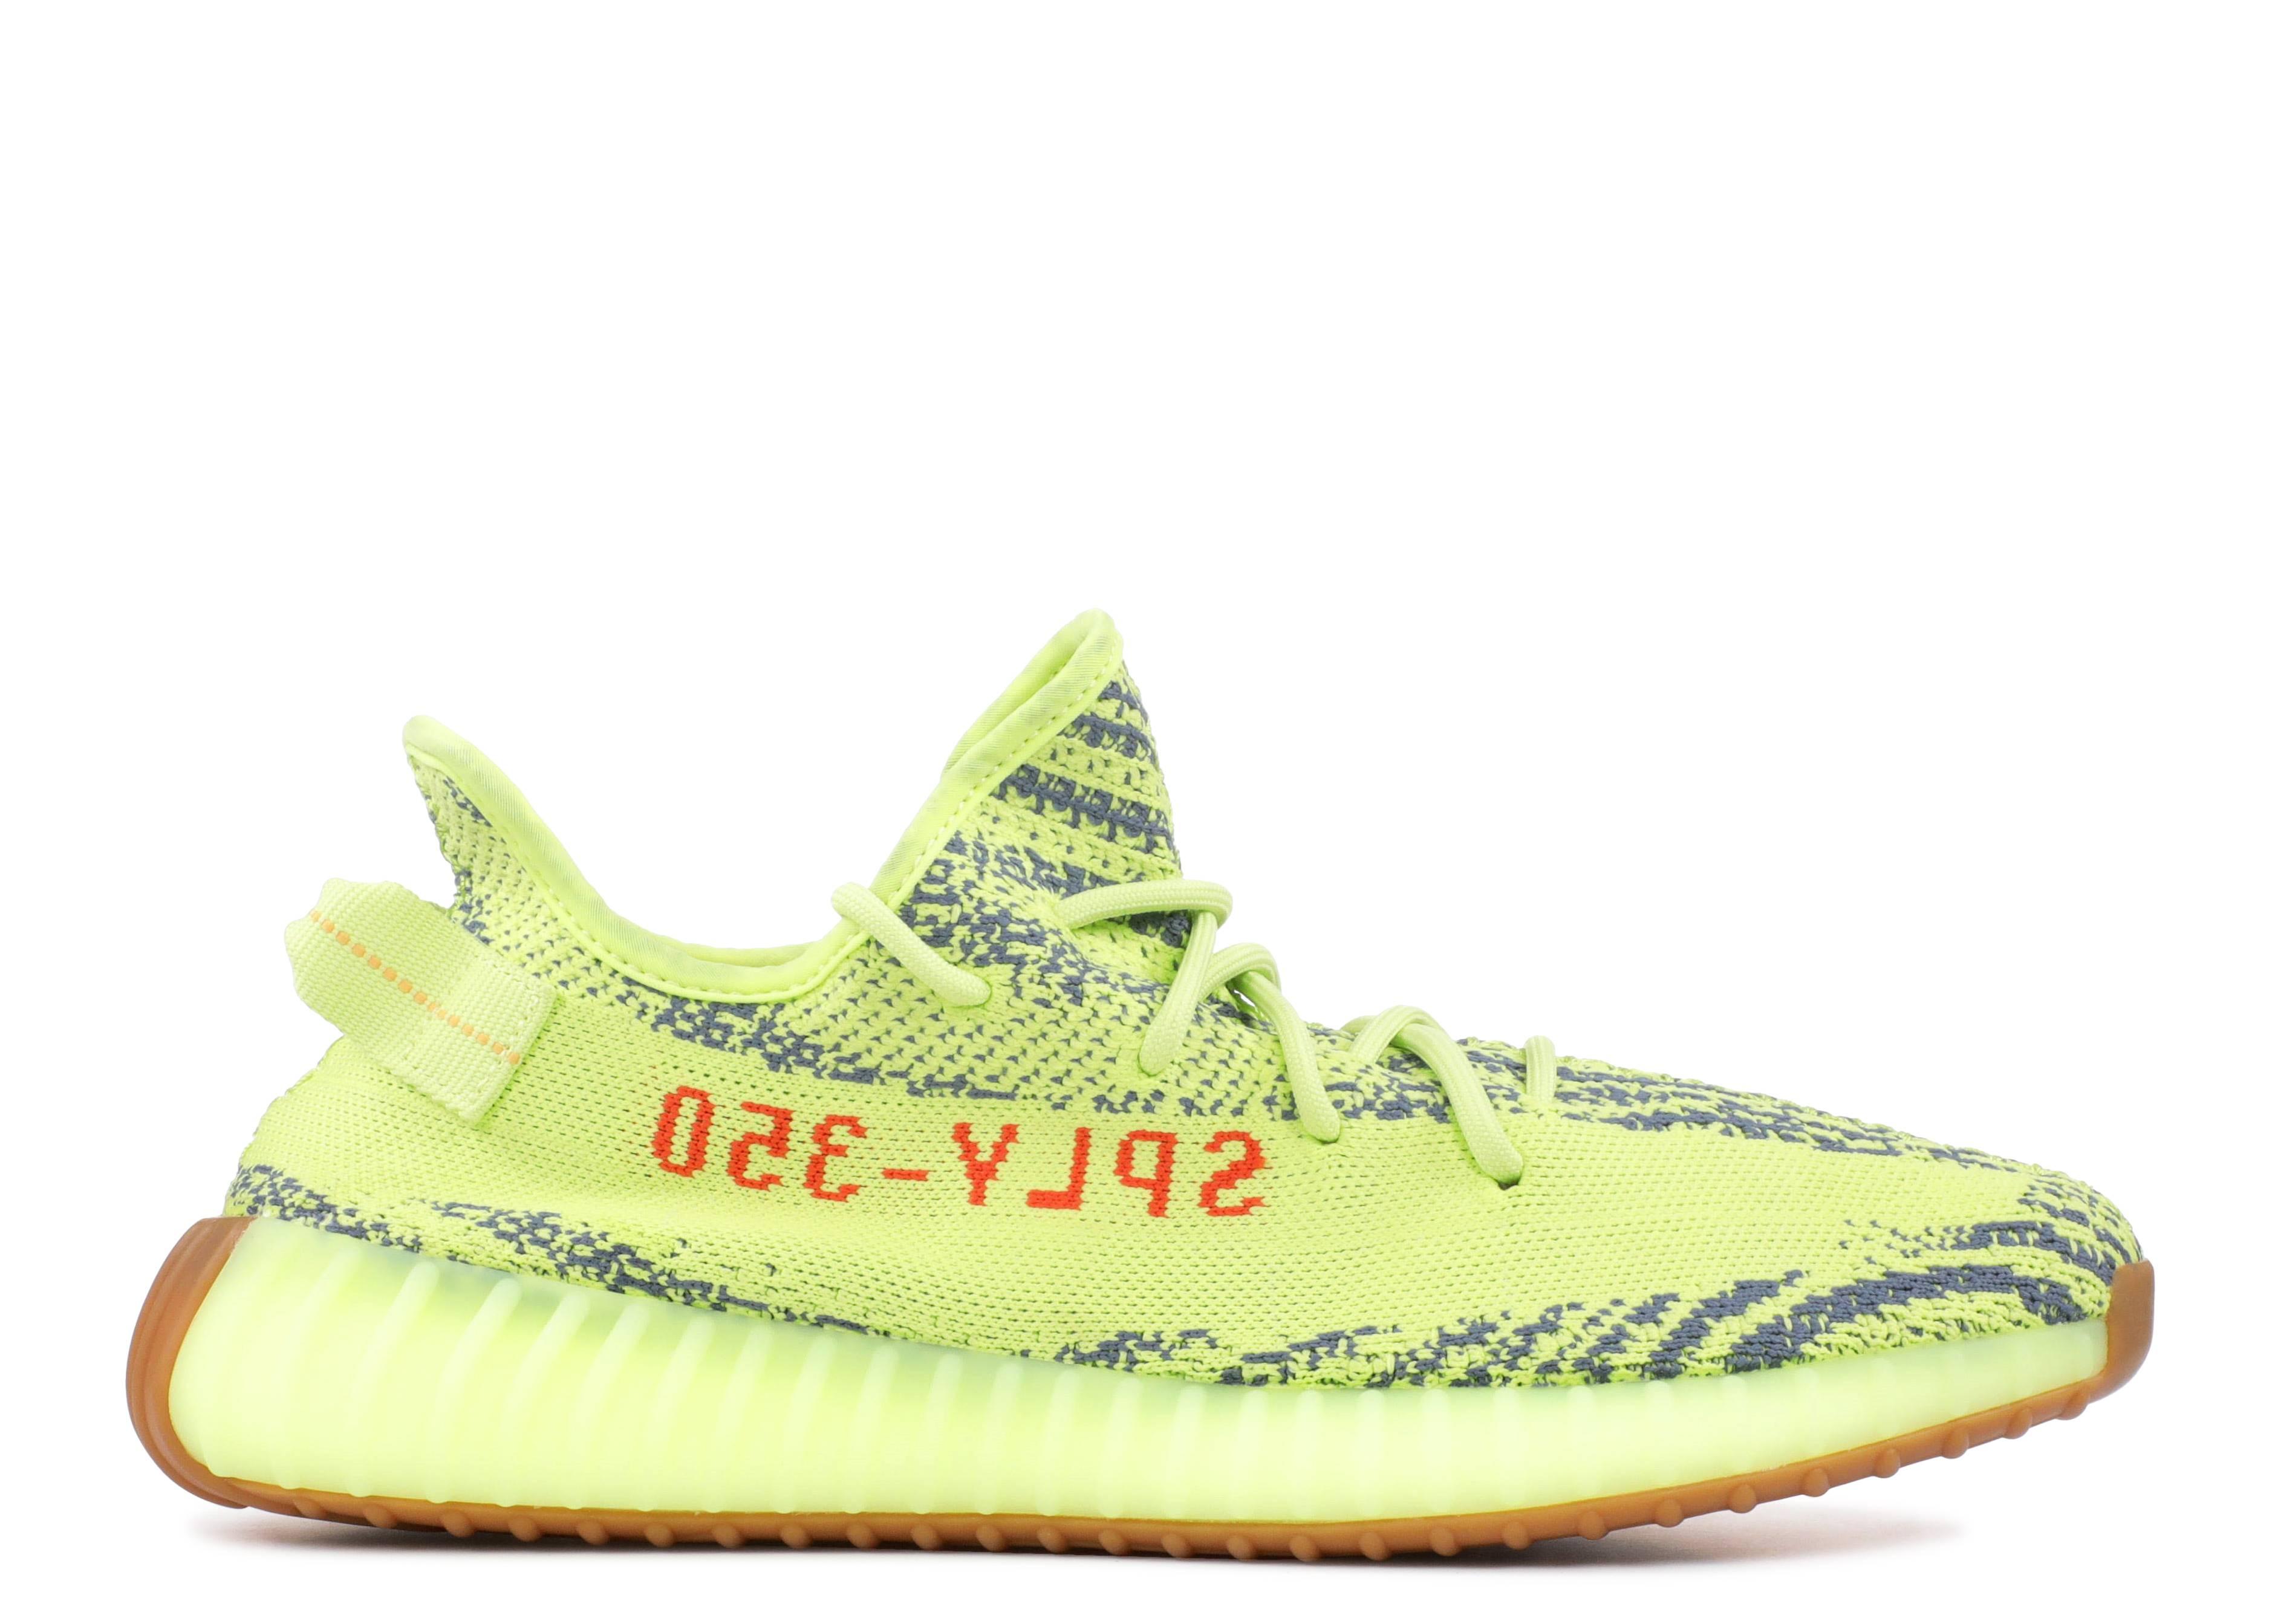 adidas yeezy boost 350 v2 green